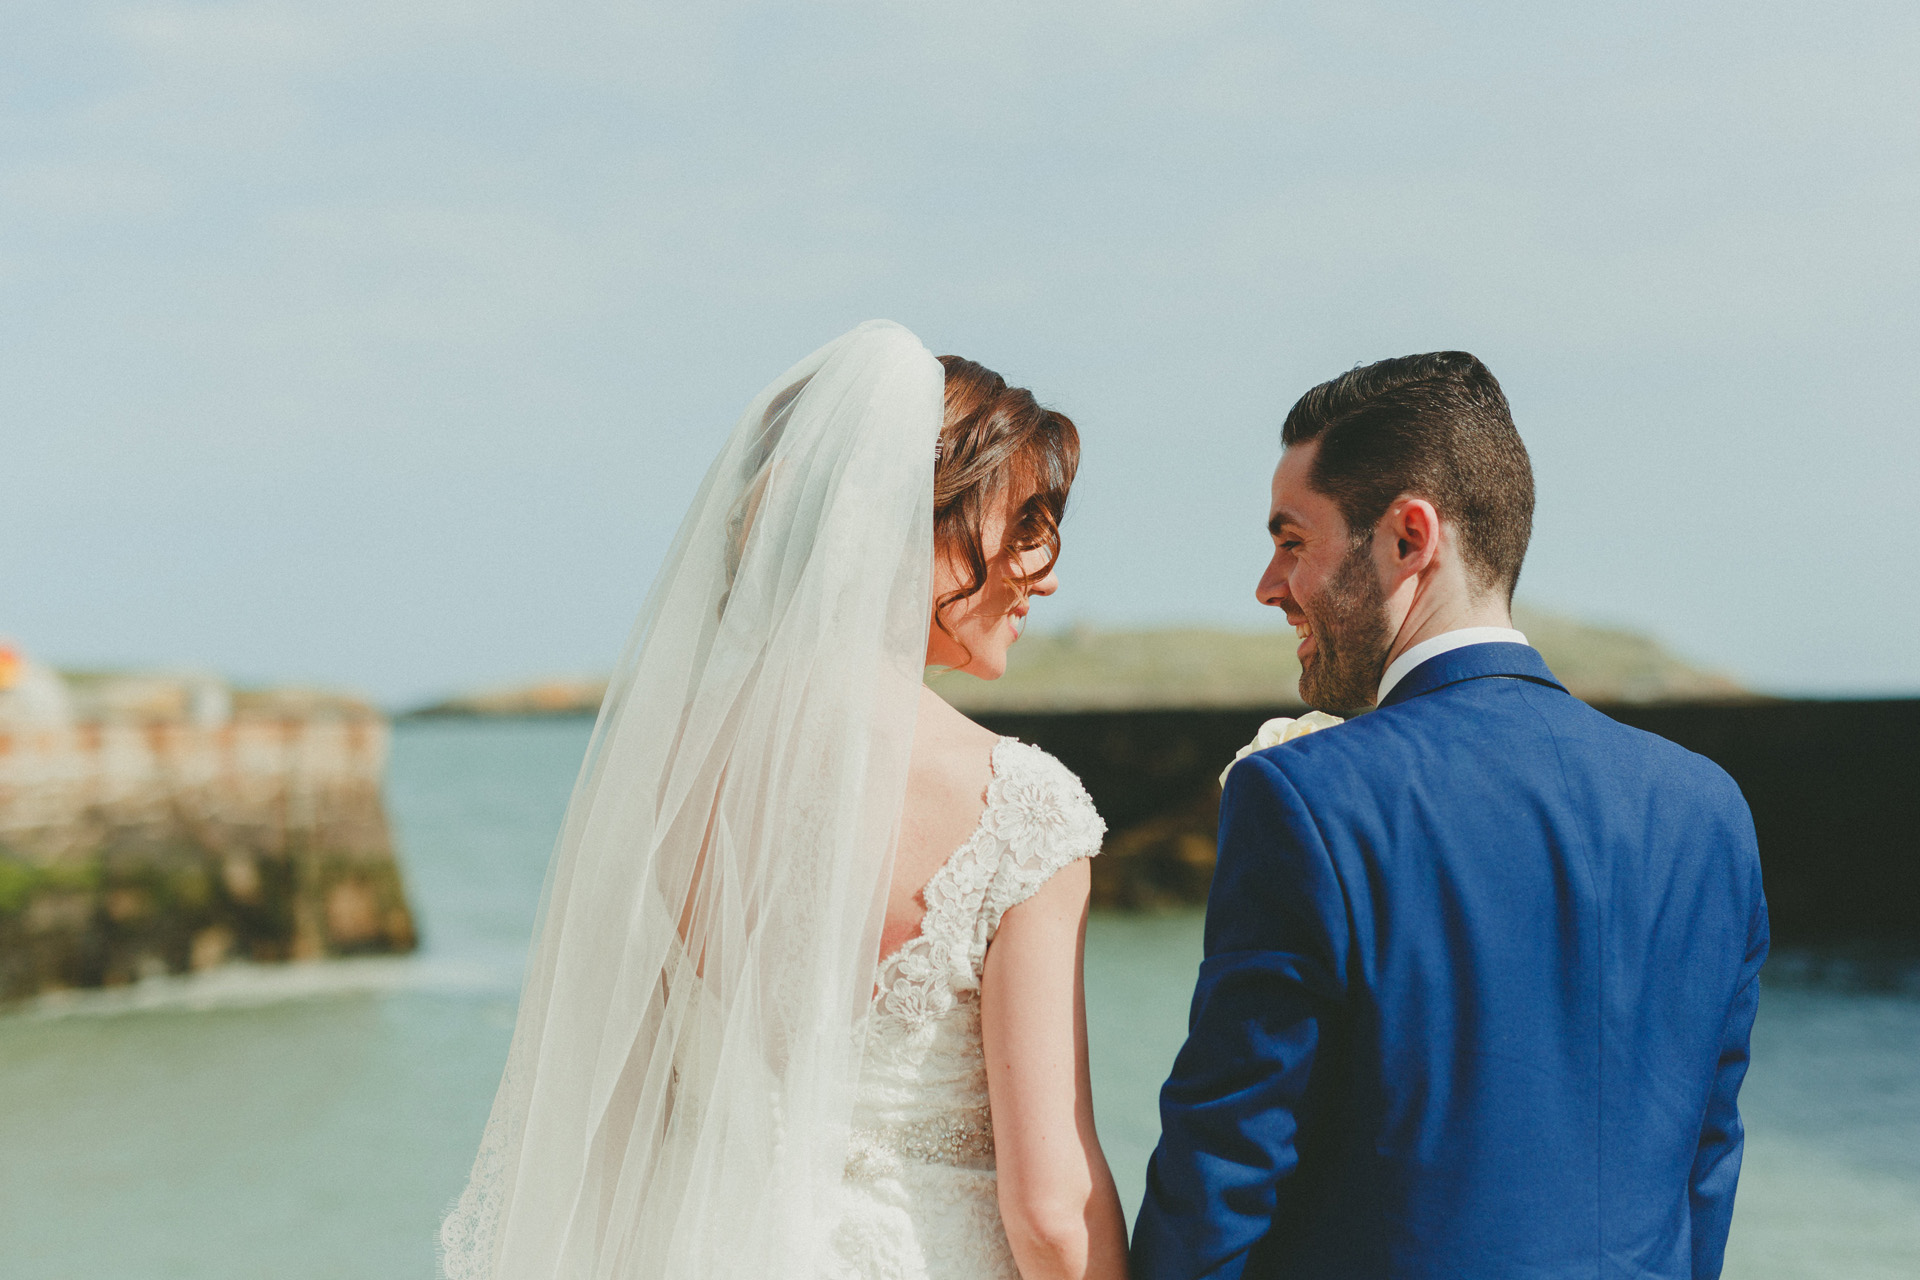 Royal-marine-hotel-wedding-photos5